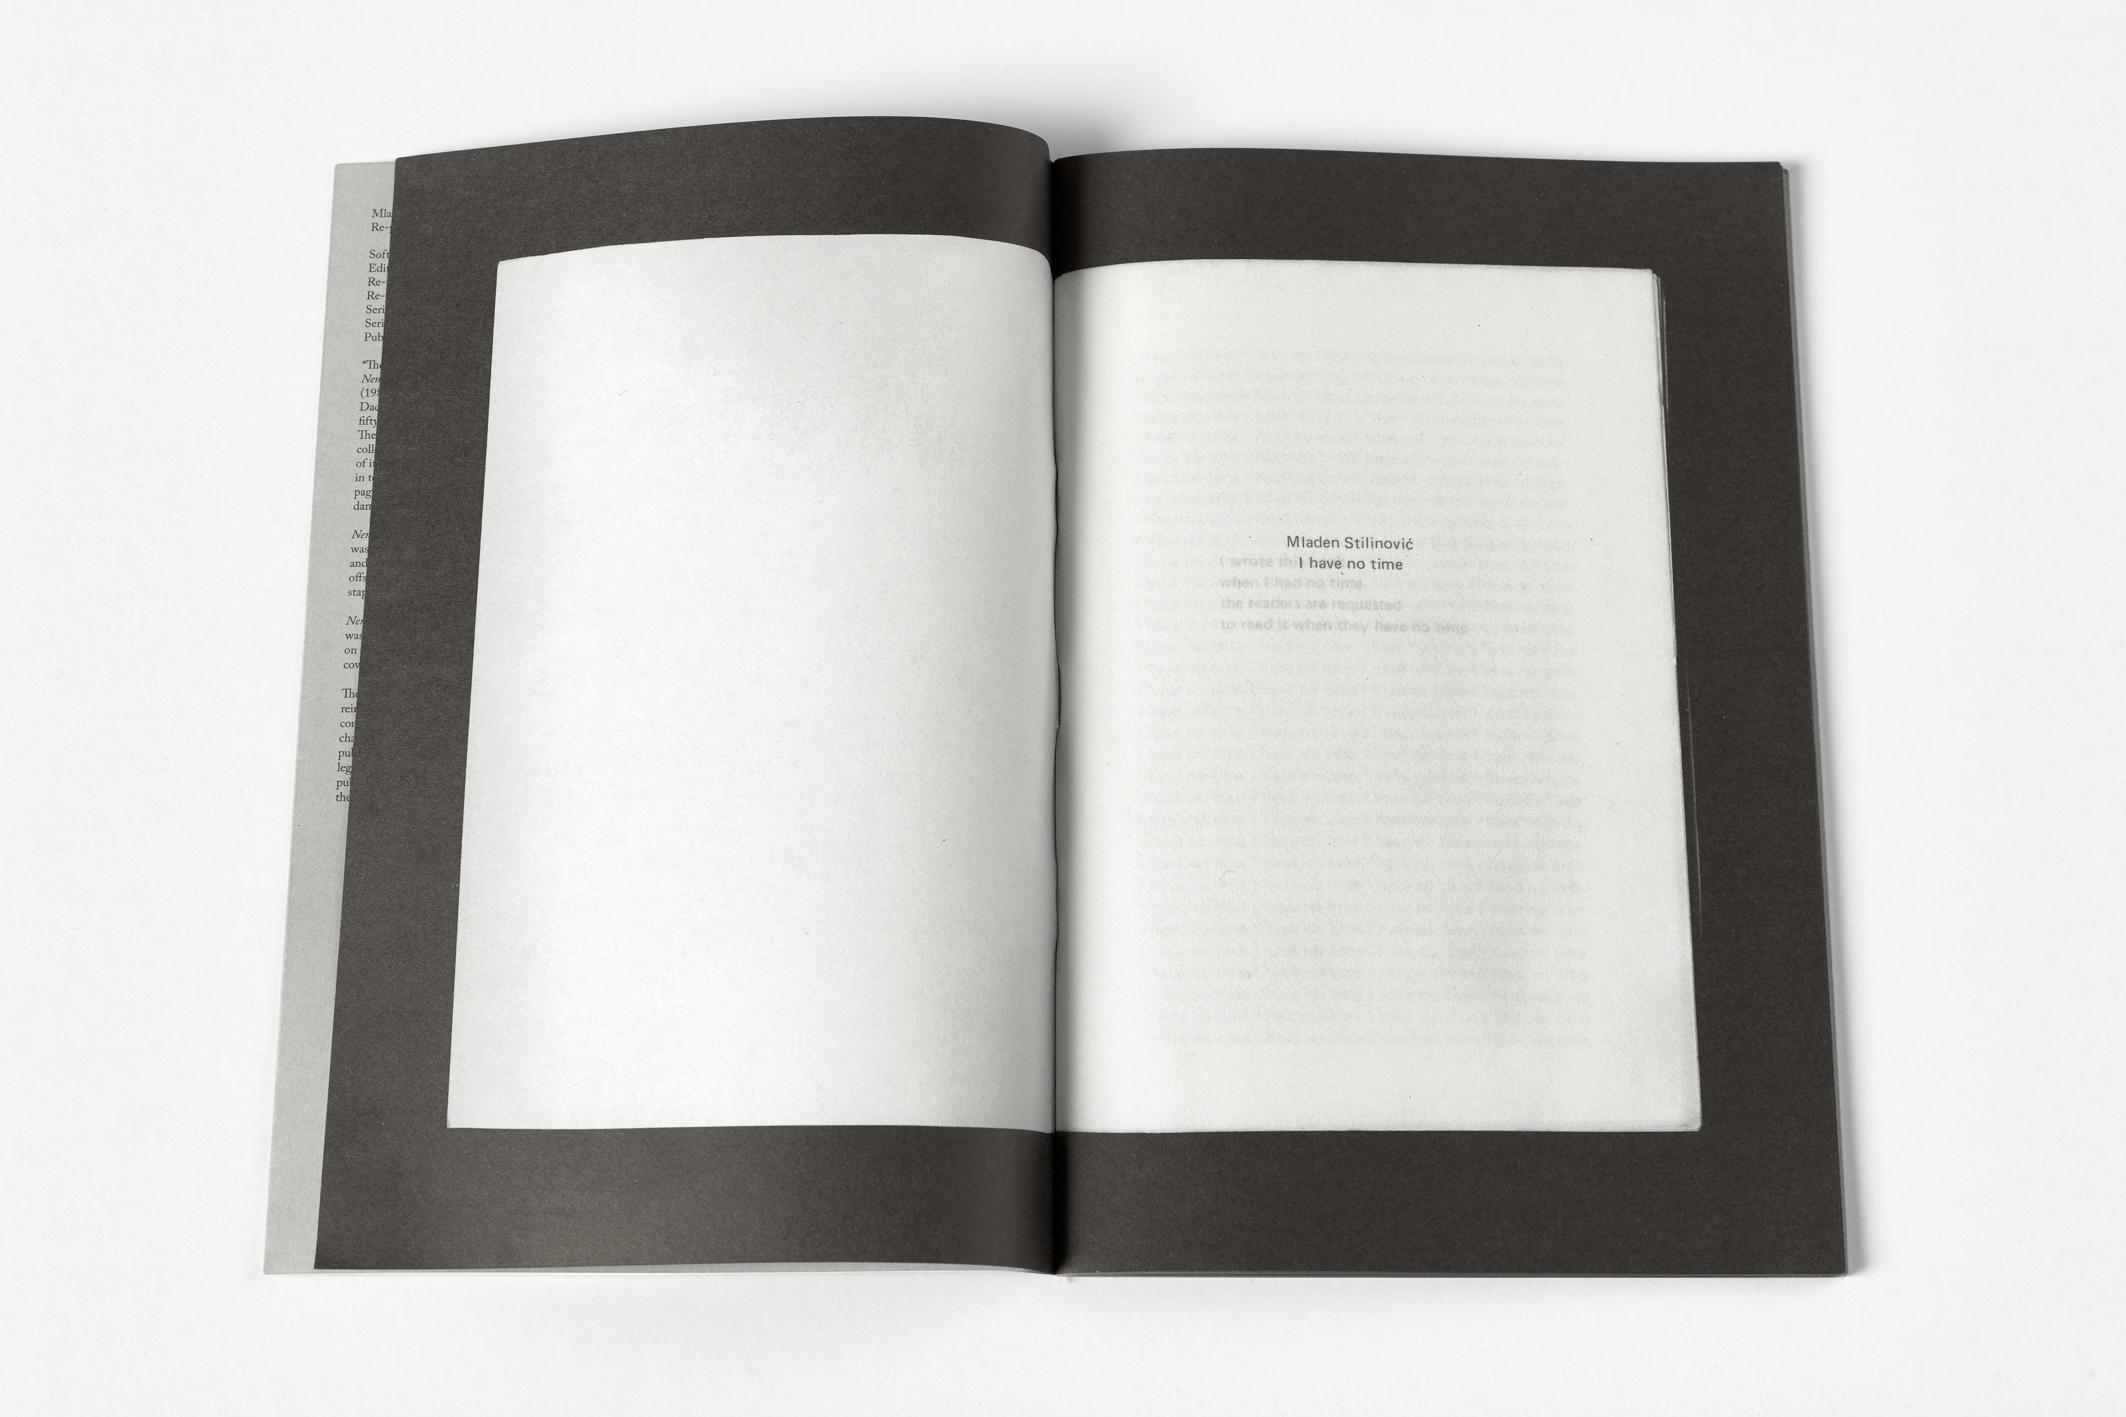 3Ply - Reprint No. 3-029.jpg